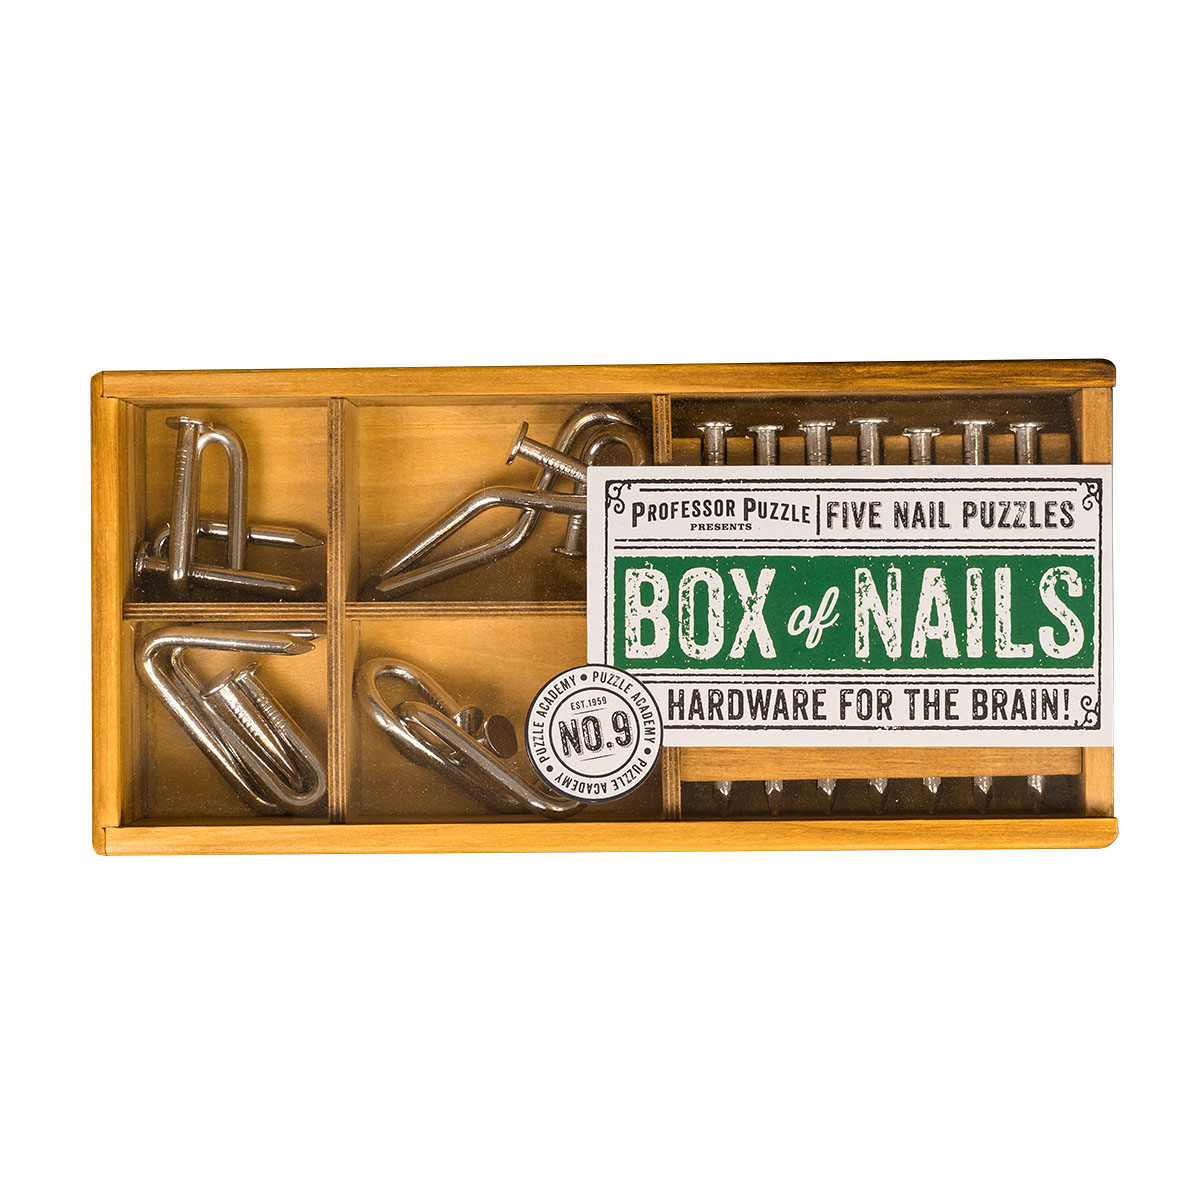 BoxOfNails_SS_PuzzleAcademy (13 of 38)